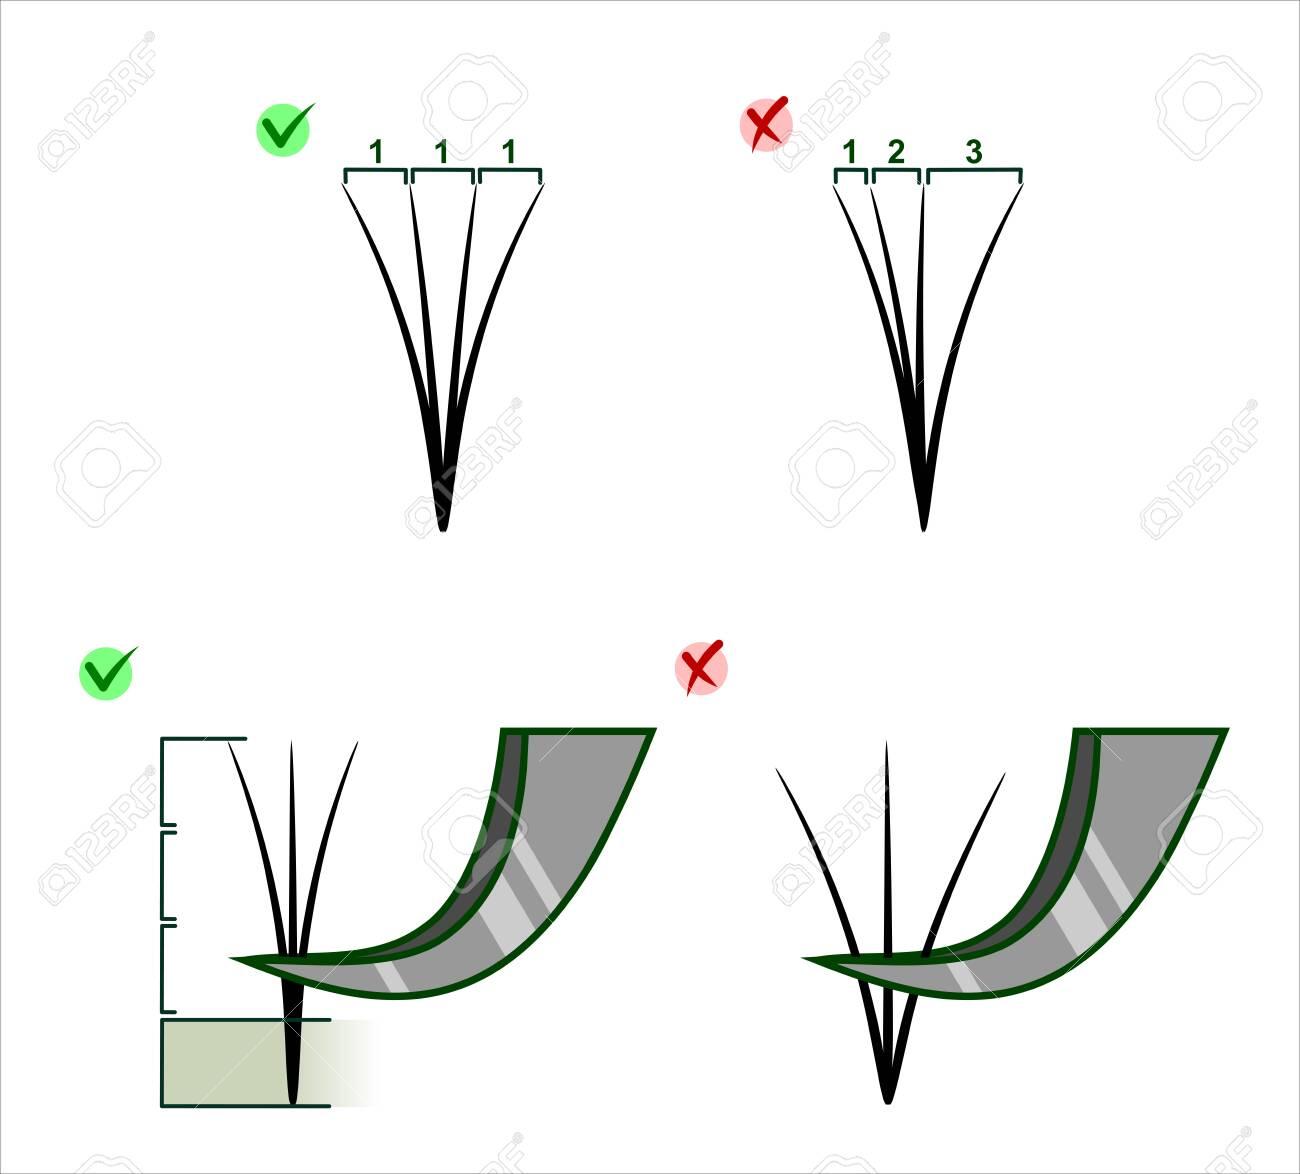 Types of forceps for building eyelashes - 130800599